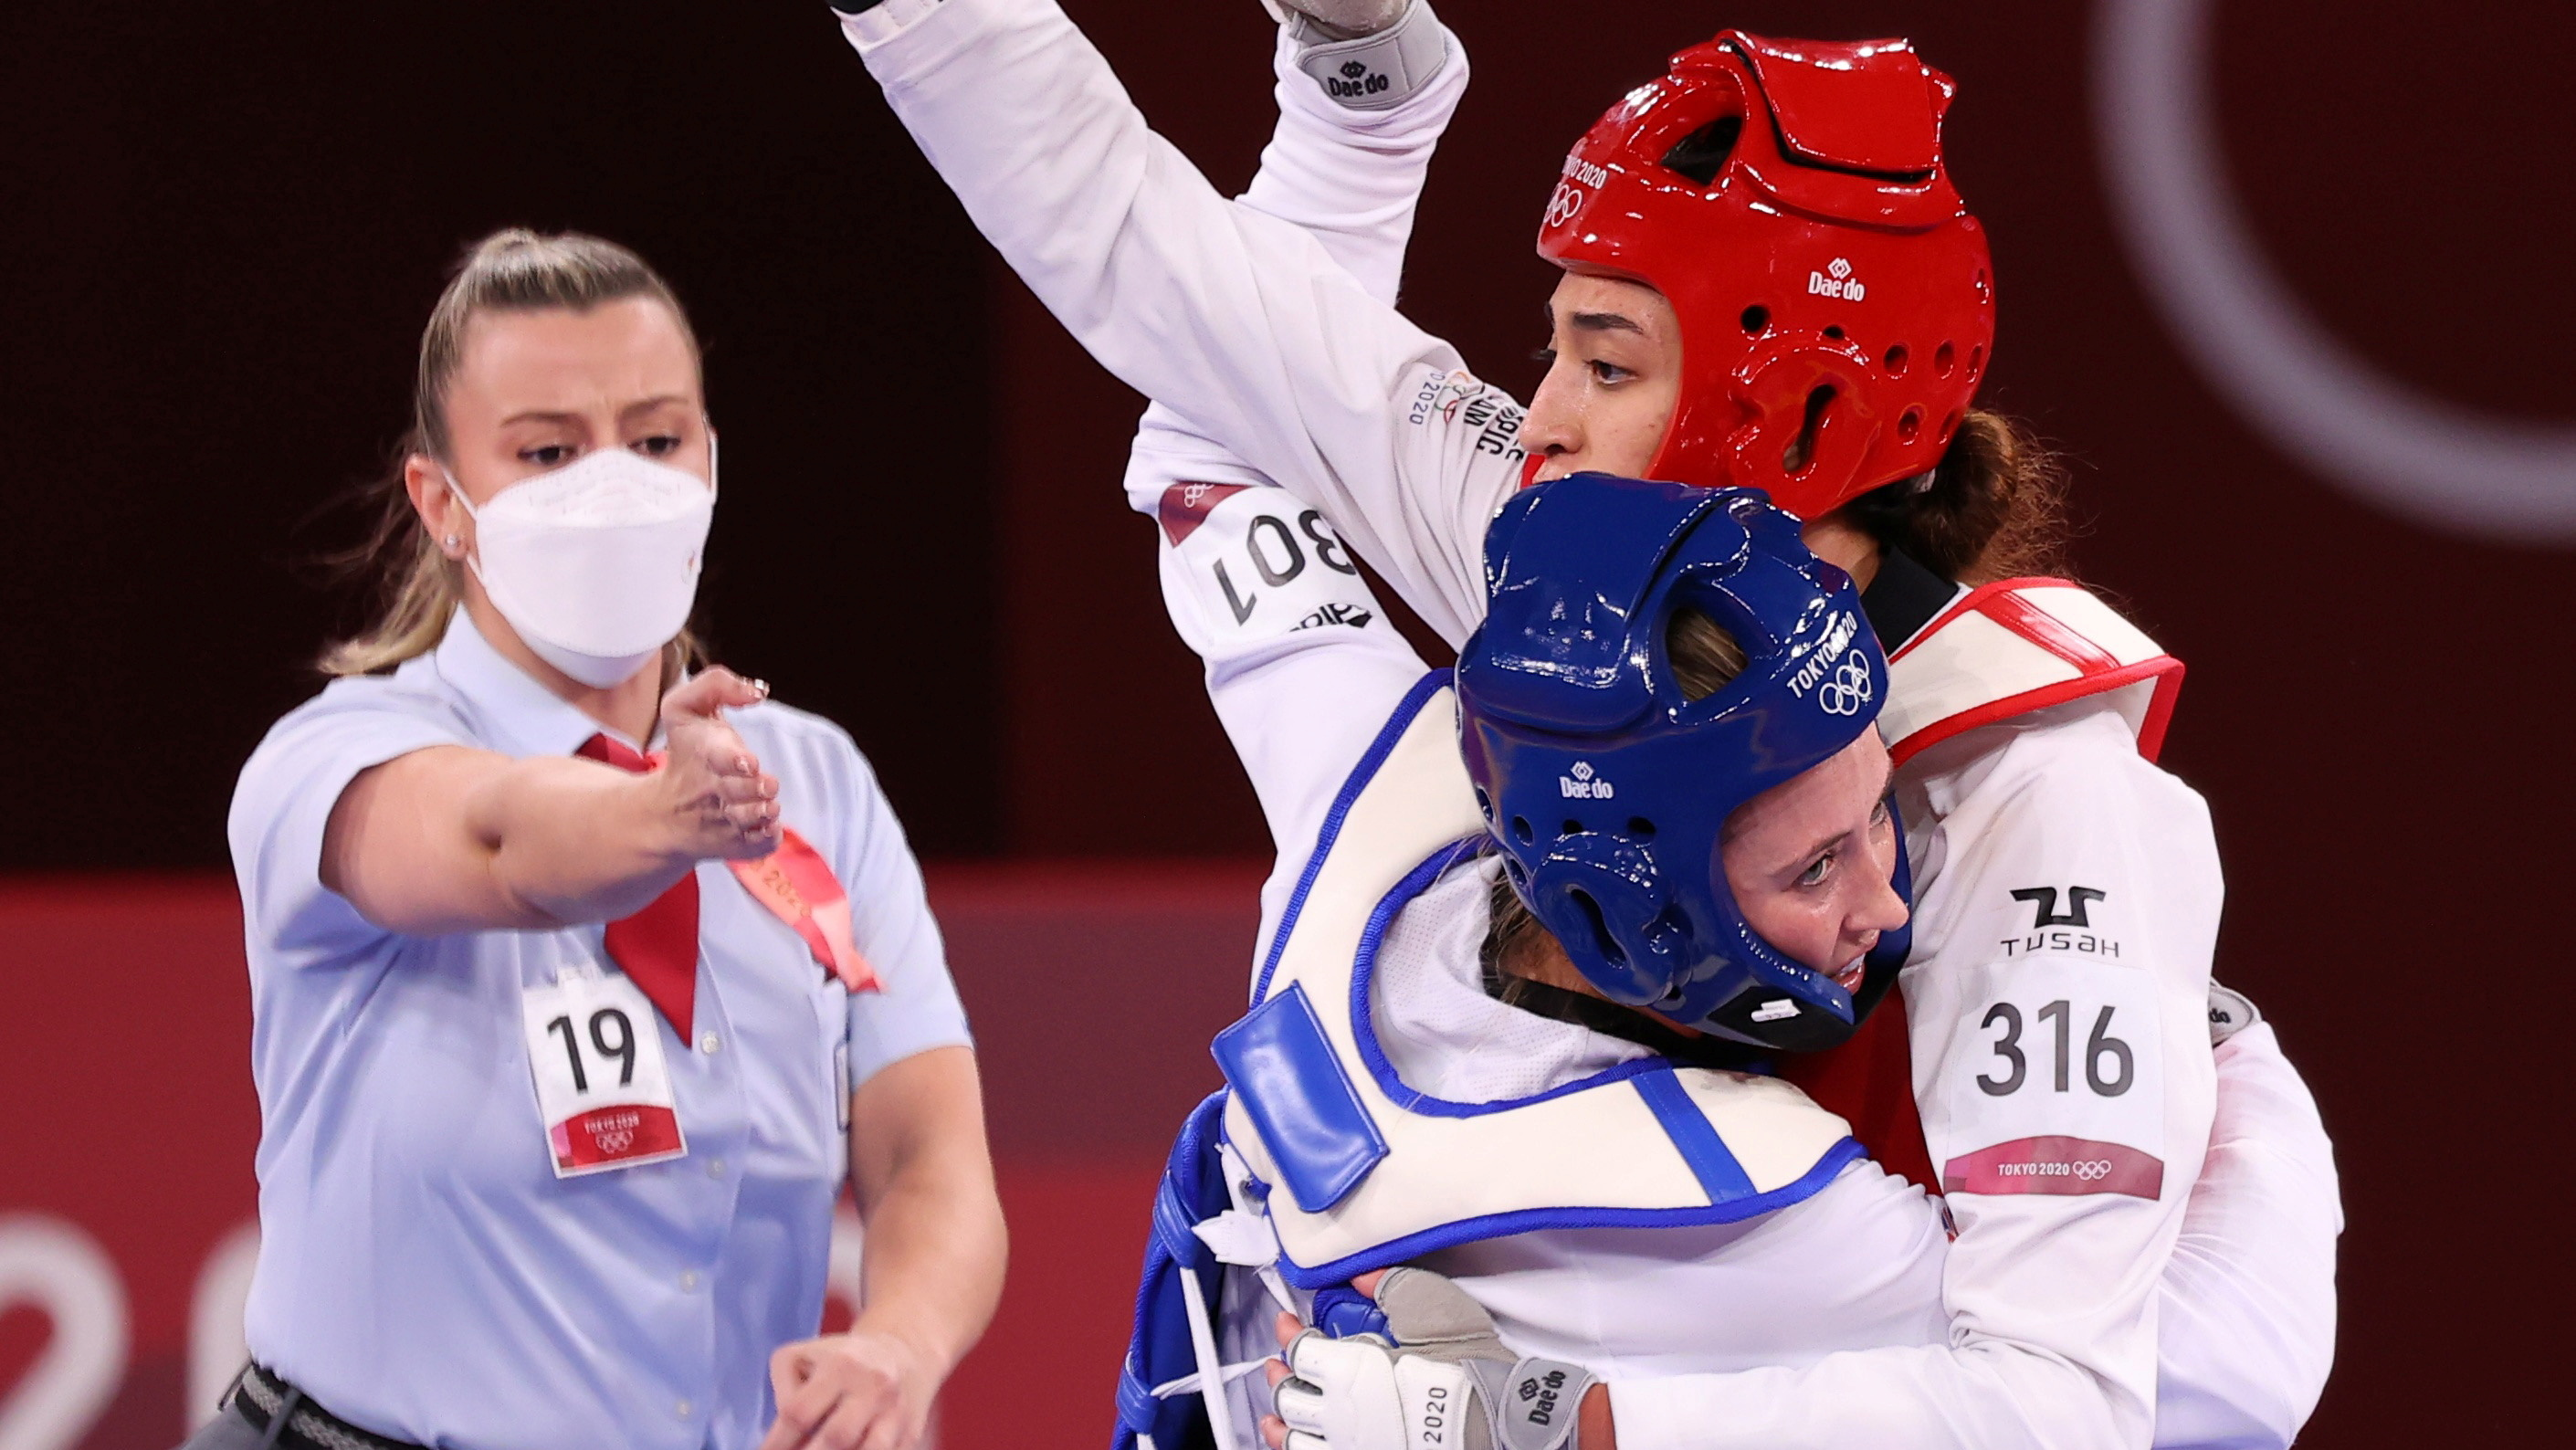 Tokyo 2020 Olympics - Taekwondo - Women's Featherweight 49-57kg - Last 16 - Makuhari Messe Hall A, Chiba, Japan - July 25, 2021. Jade Jones of Britain in action against Kimia Alizadeh of the Refugee Olympic Team REUTERS/Murad Sezer